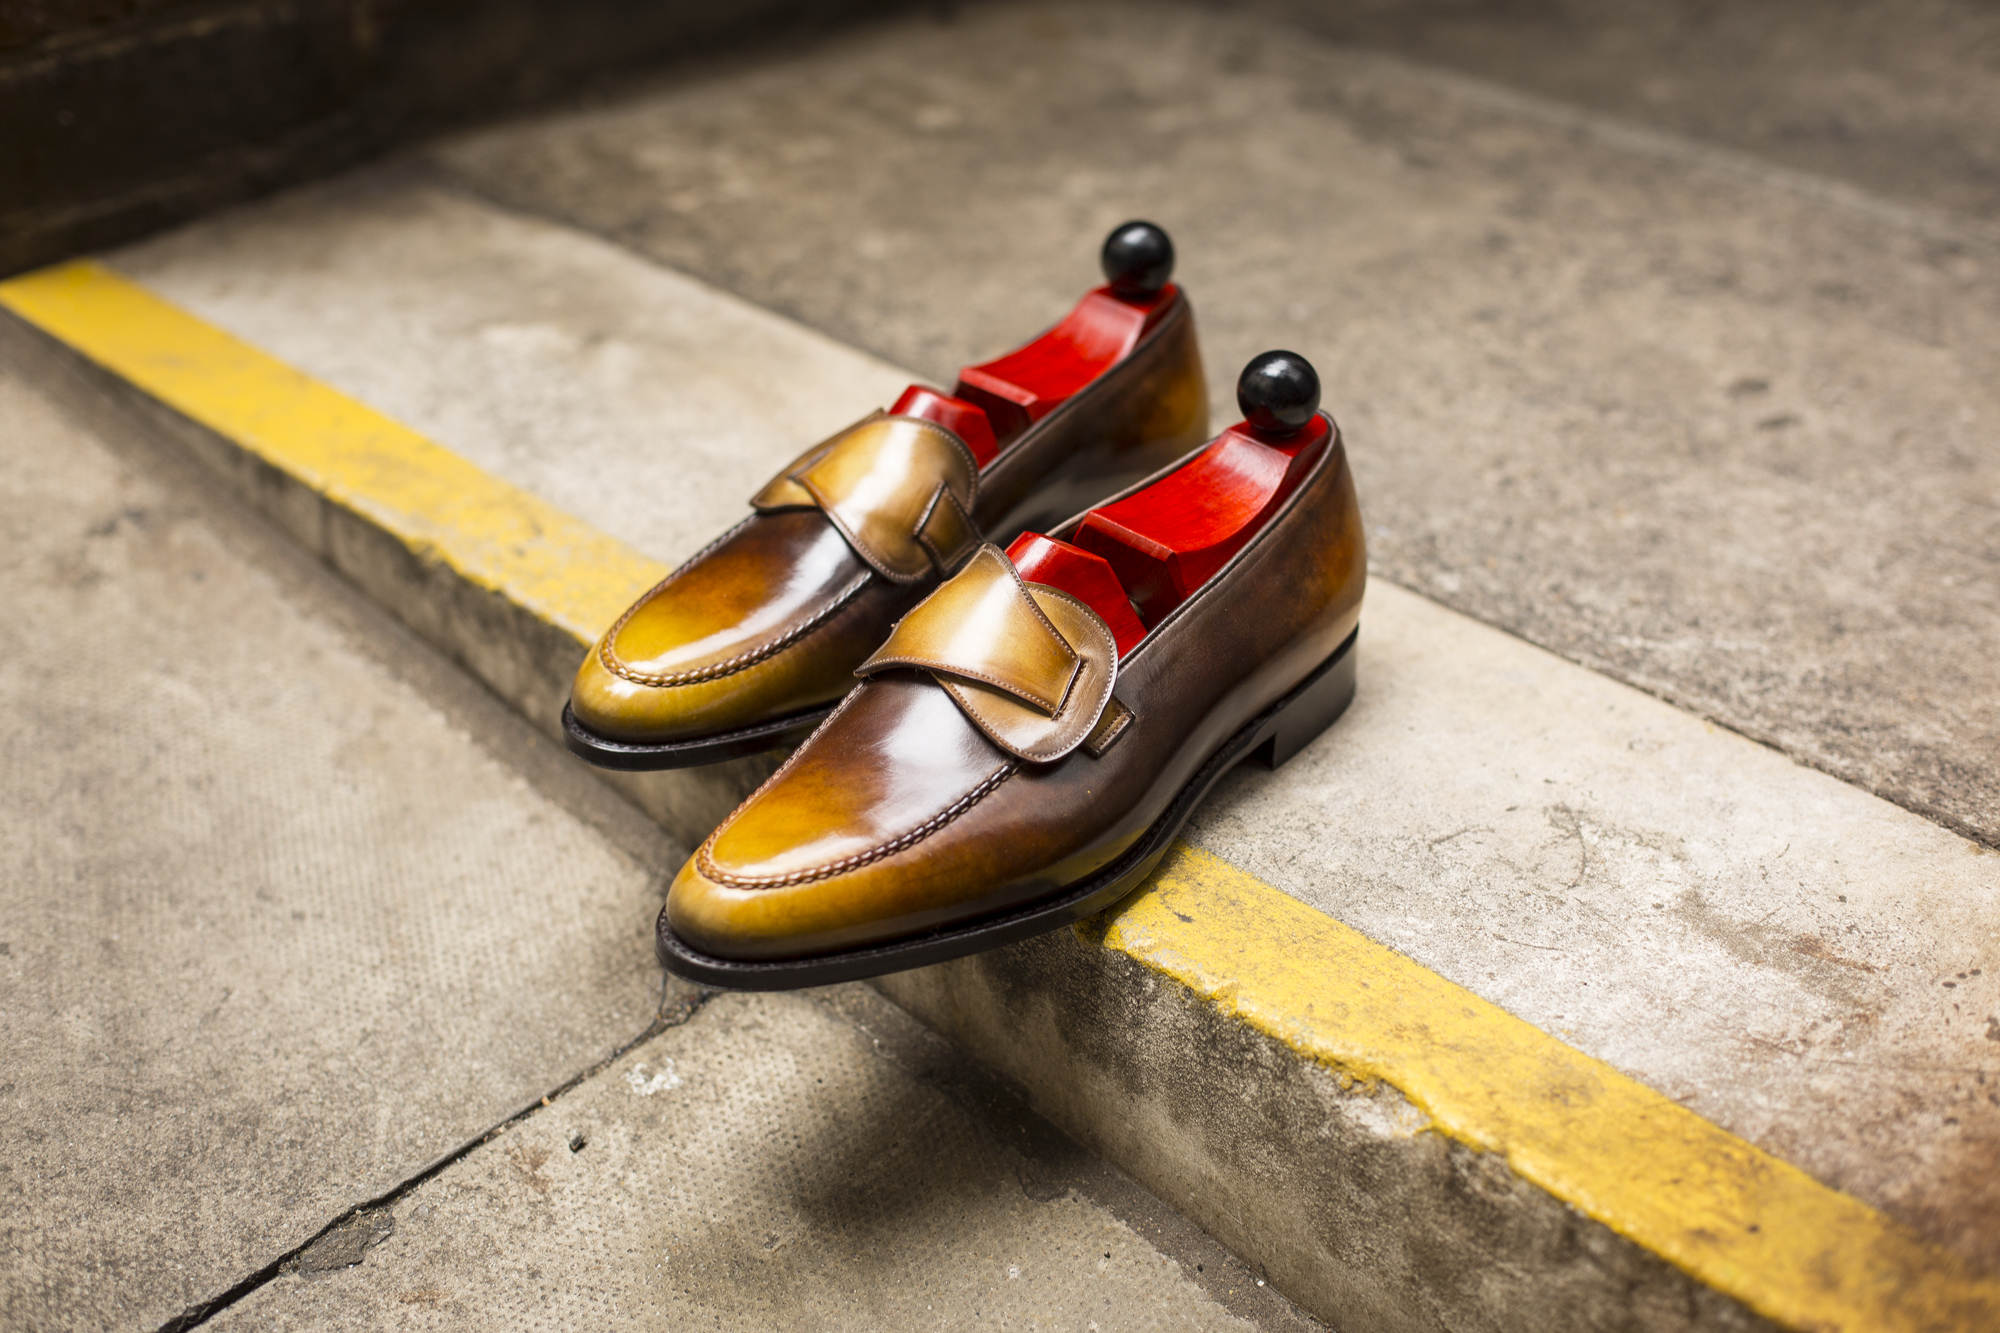 j-fitzpatrick-footwear-collection-5-may-2017-hero-0205.jpg